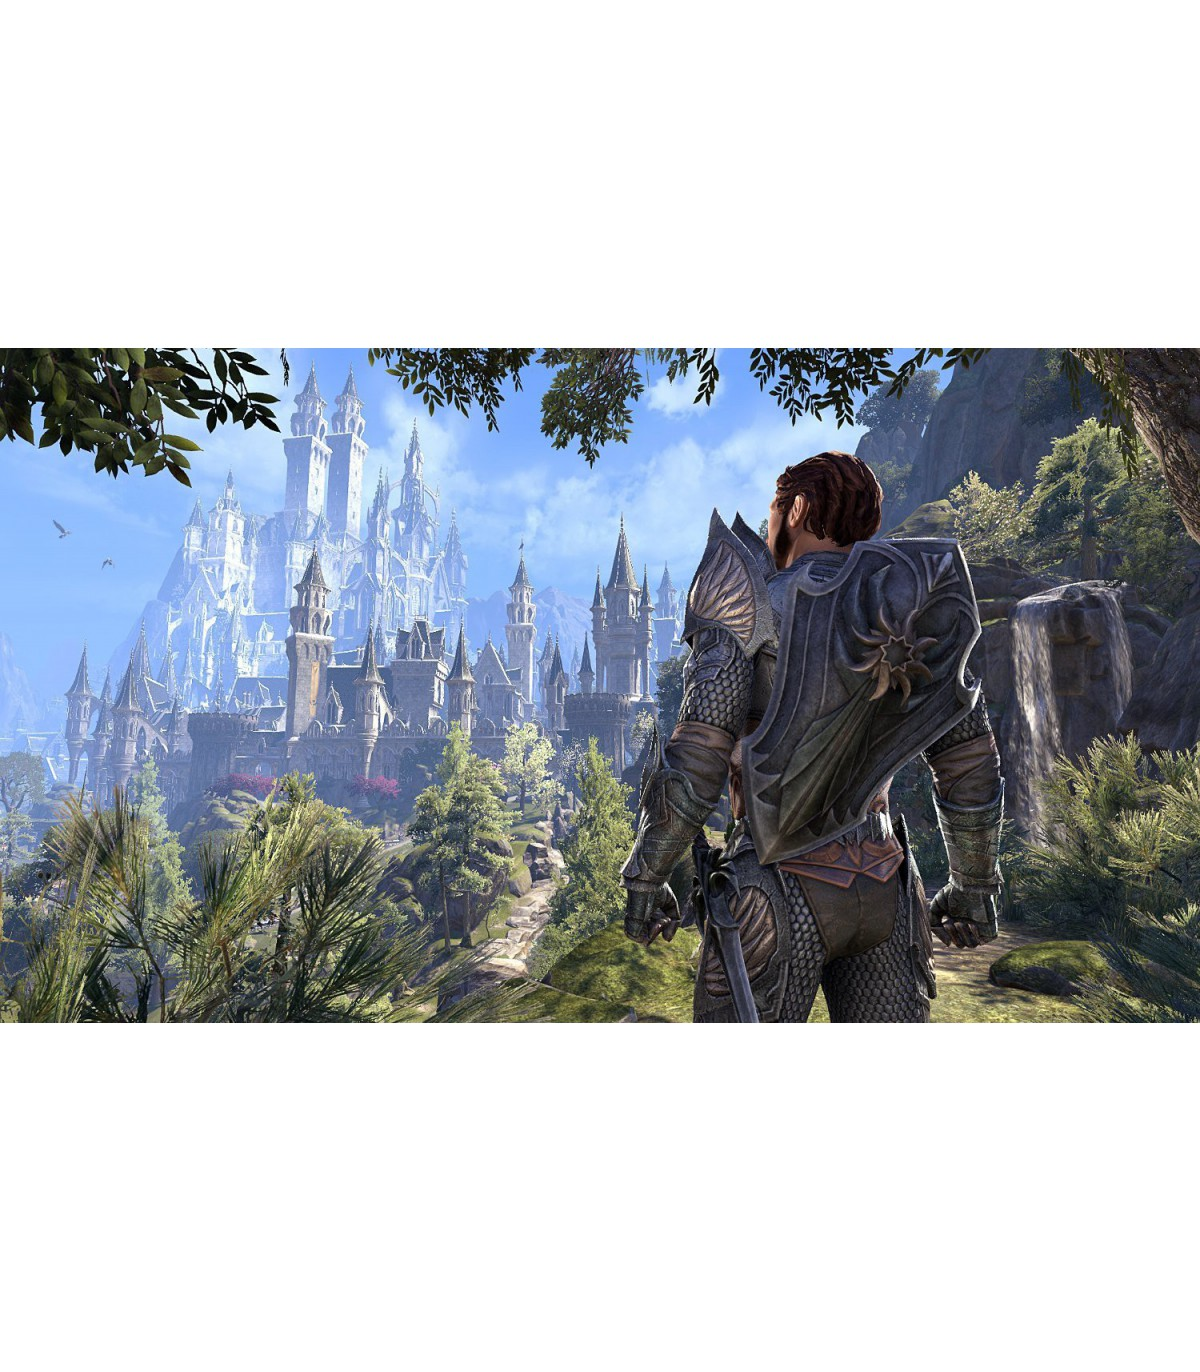 بازی The Elder Scrolls Online: Summerset - پلی استیشن 4